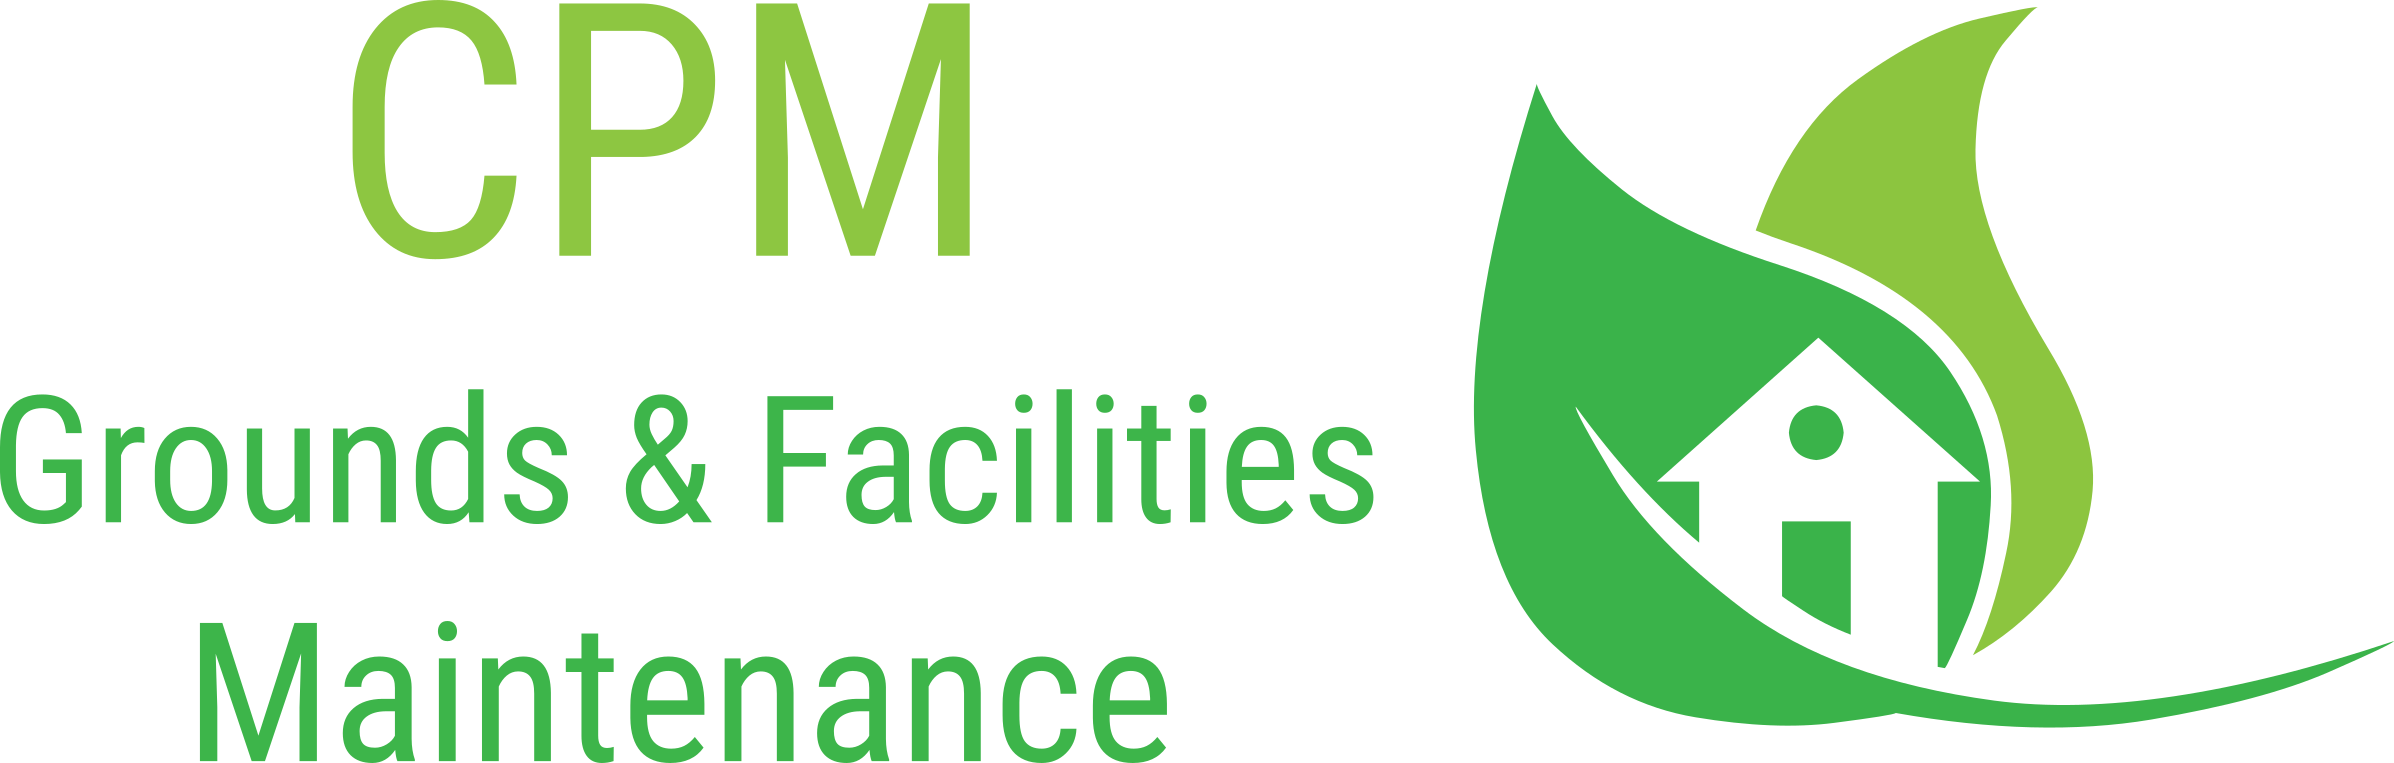 CPM Grounds maintenance & Facilities